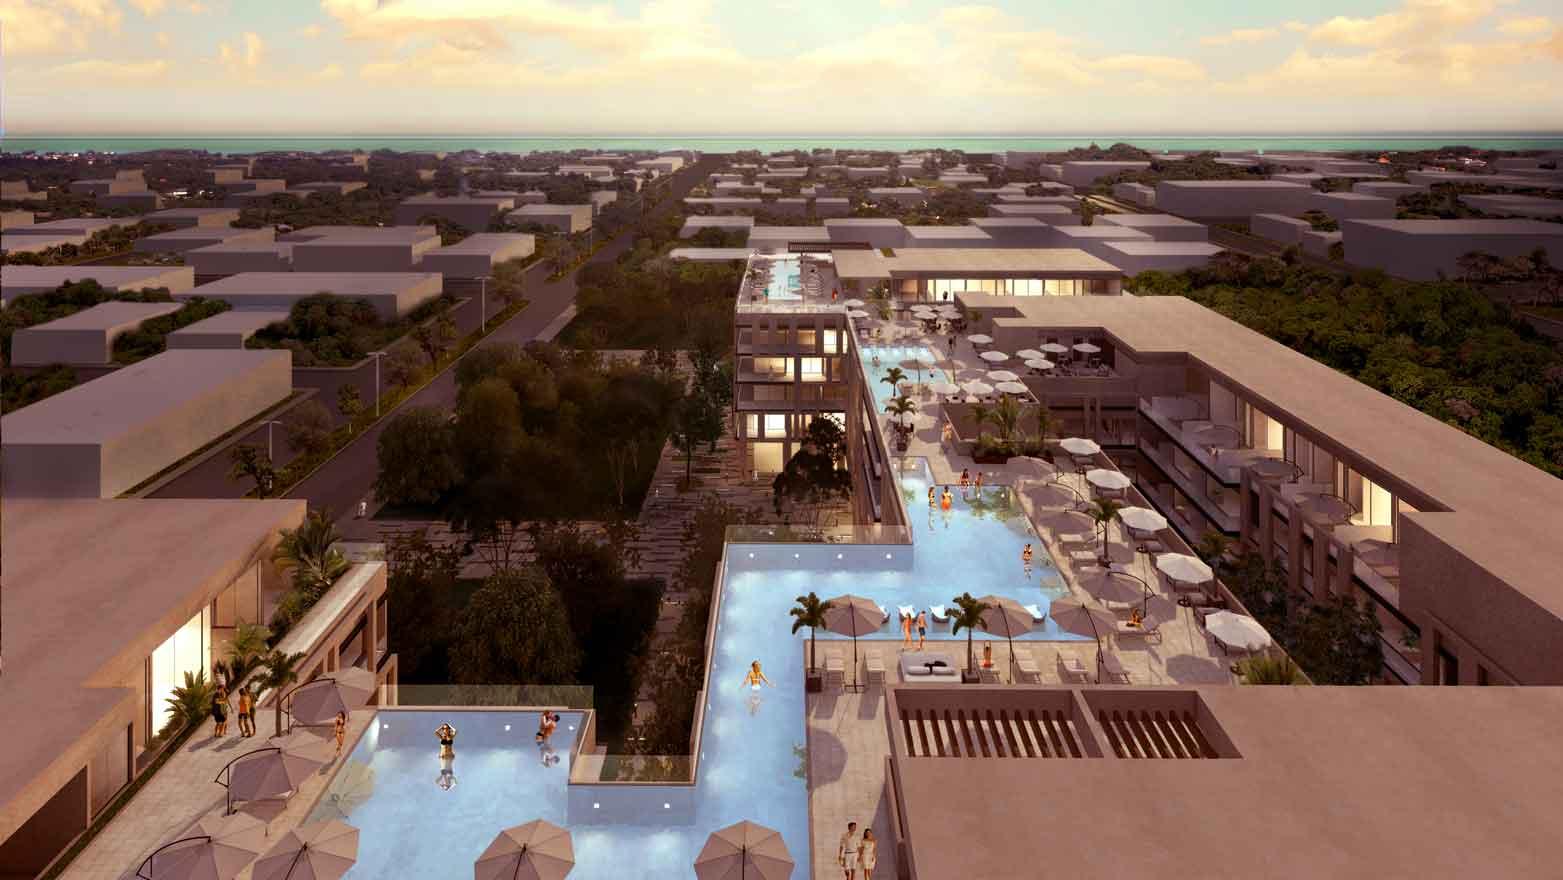 Siempre-playa---Playa-del-Carmen---Pelicano-Properties-1